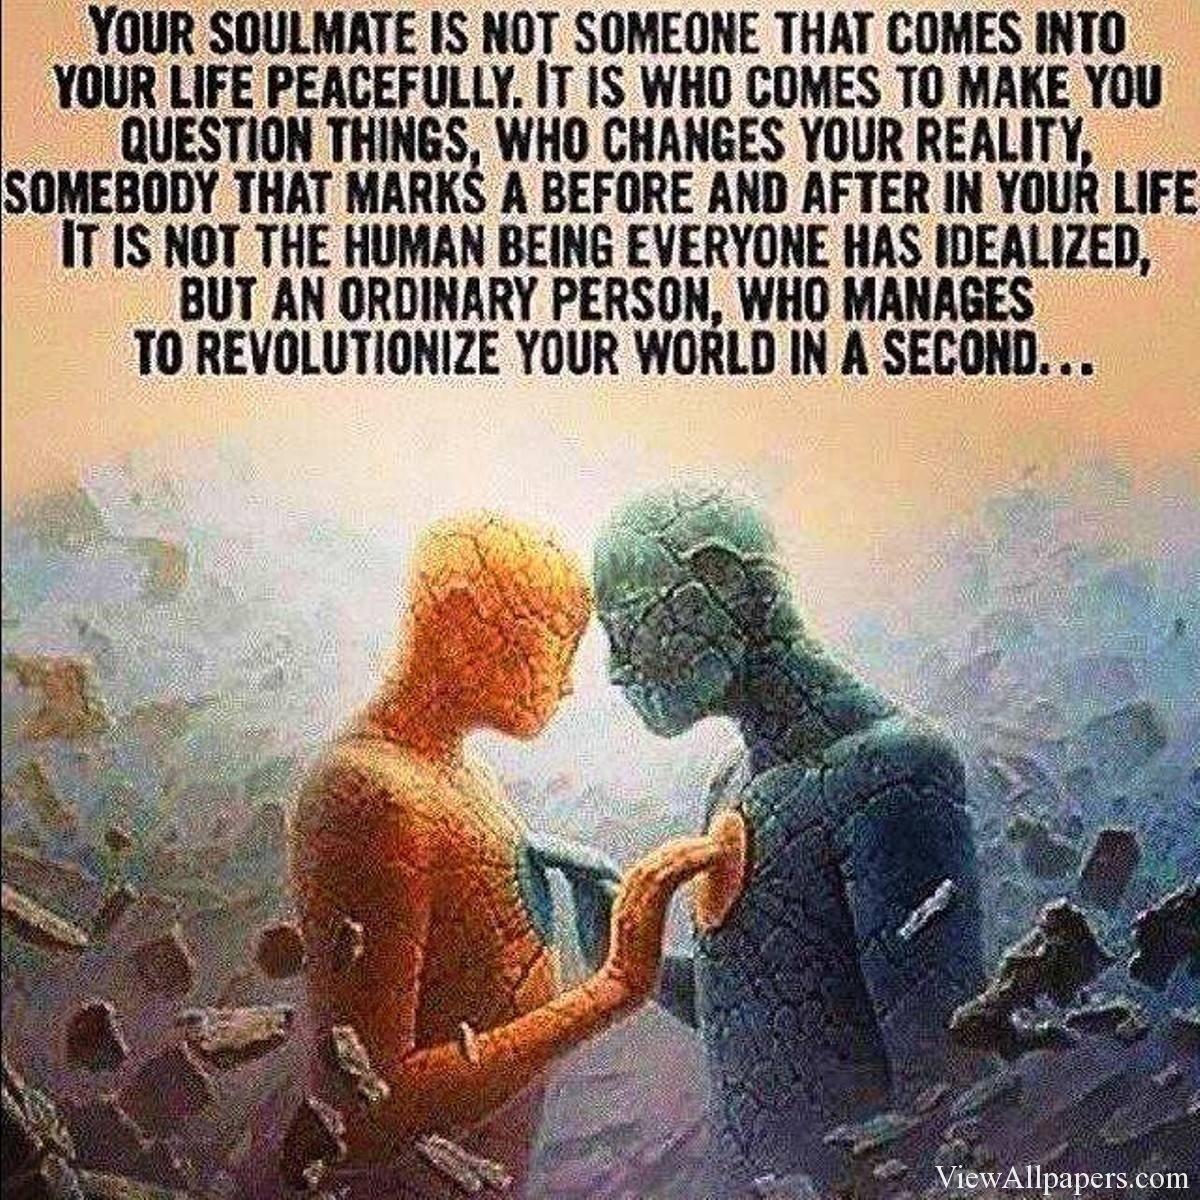 Famous Quotes About Soulmates. QuotesGram